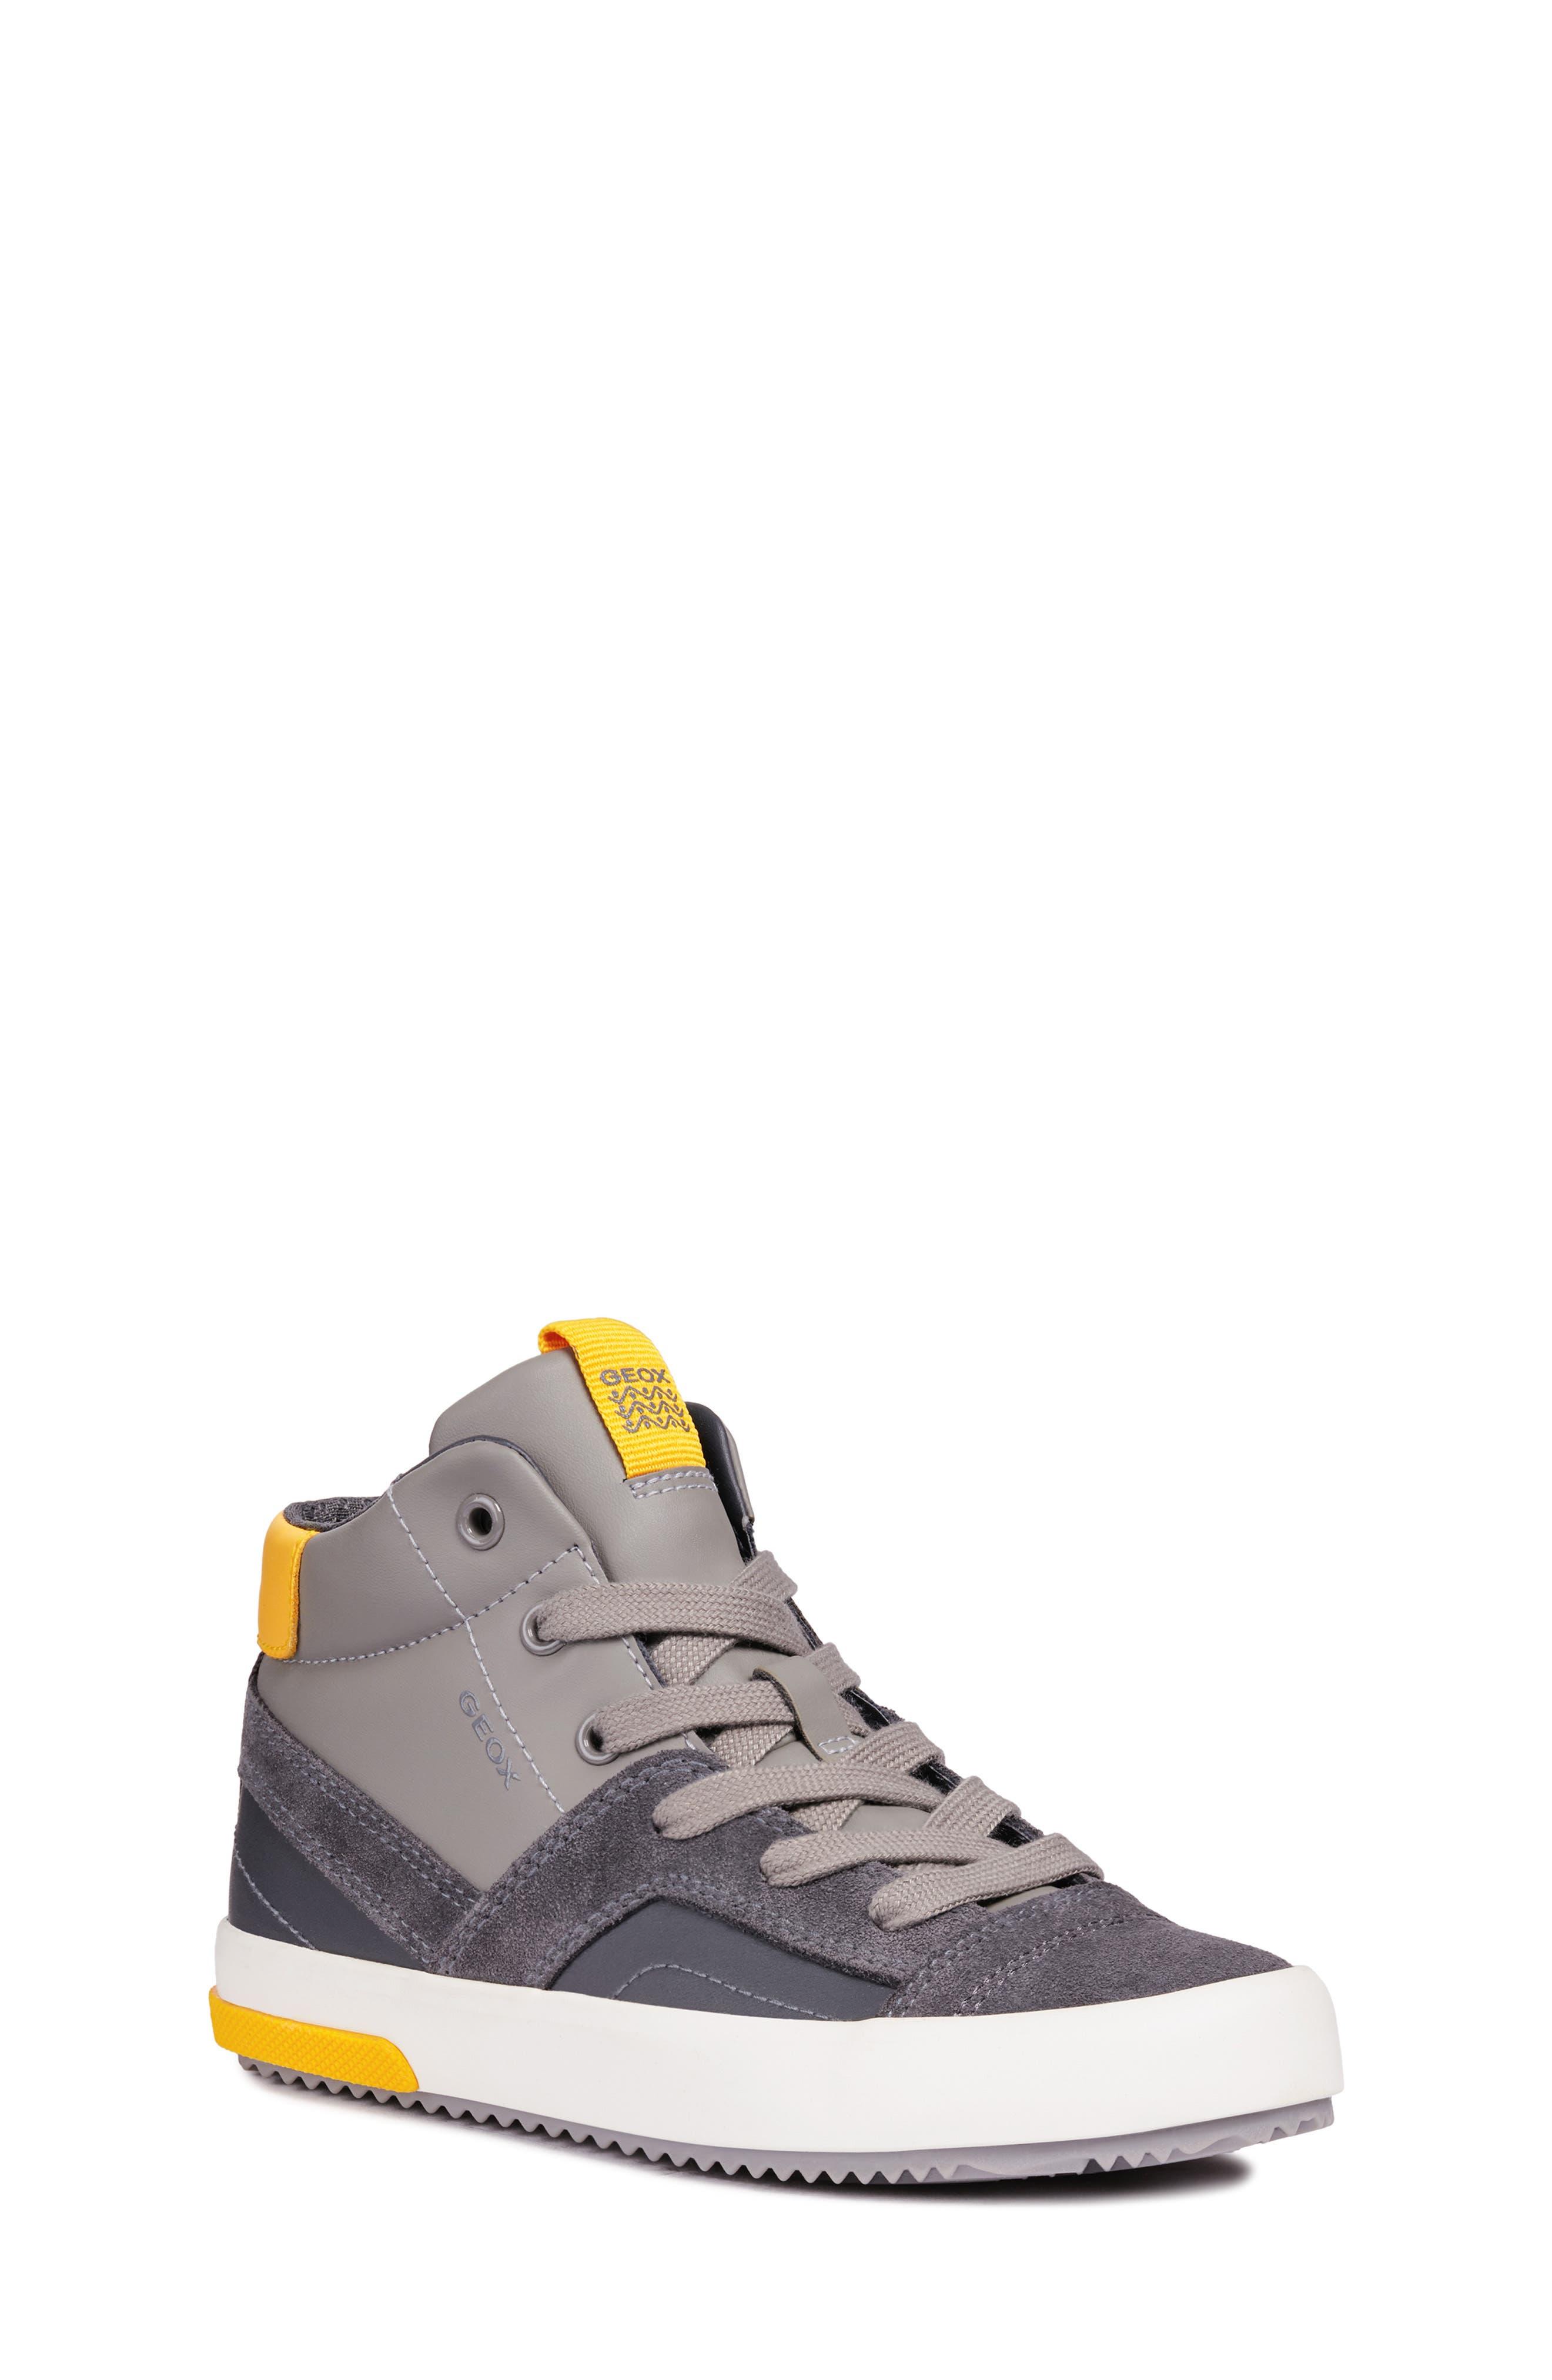 Alonisso 24 High Top Sneaker,                         Main,                         color, DARK GREY/YELLOW